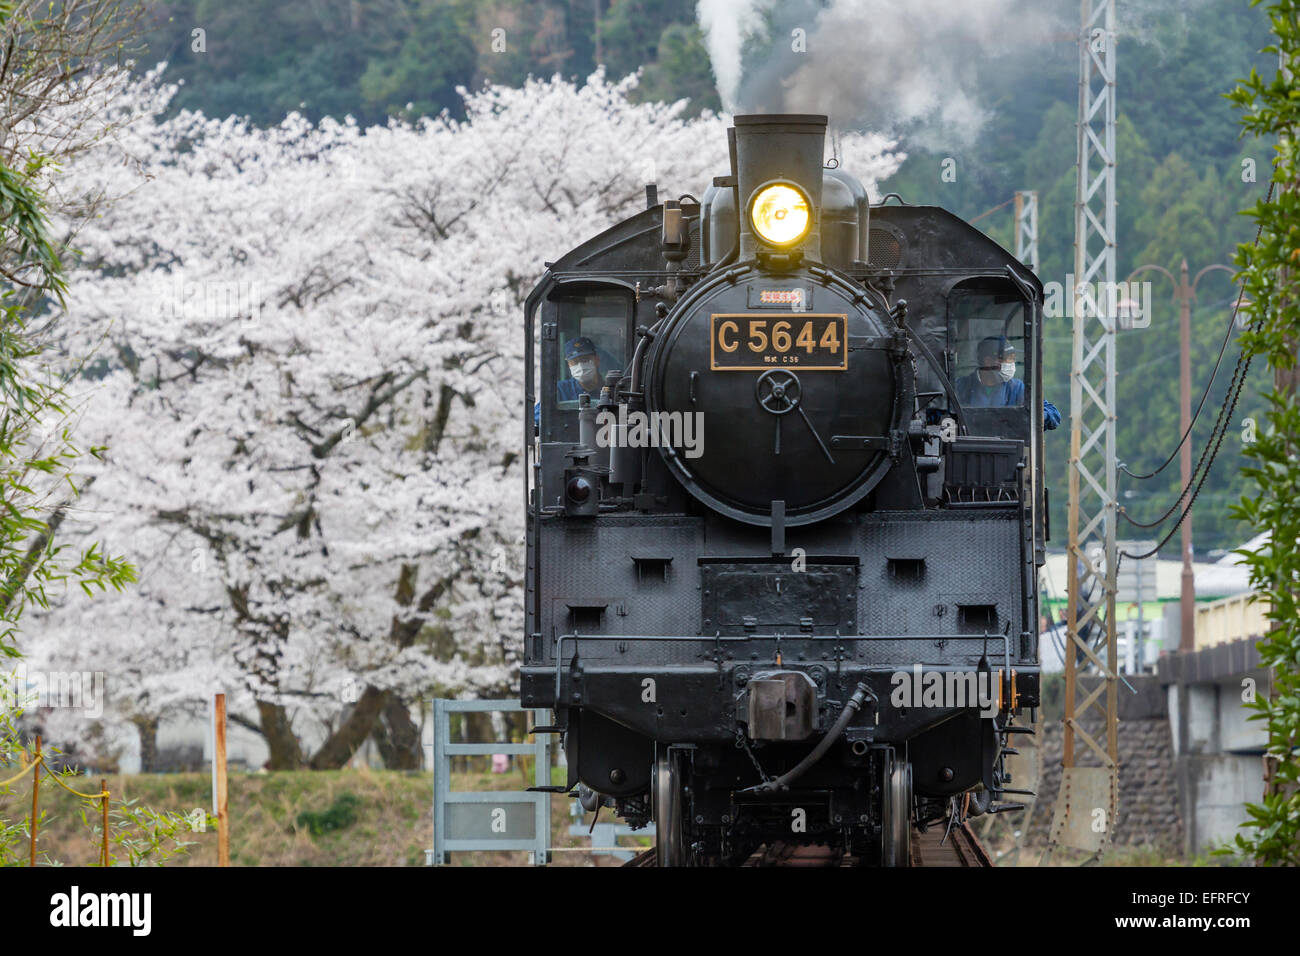 Steam Locomotive and Cherry Blossoms, Kanagawa, Japan - Stock Image